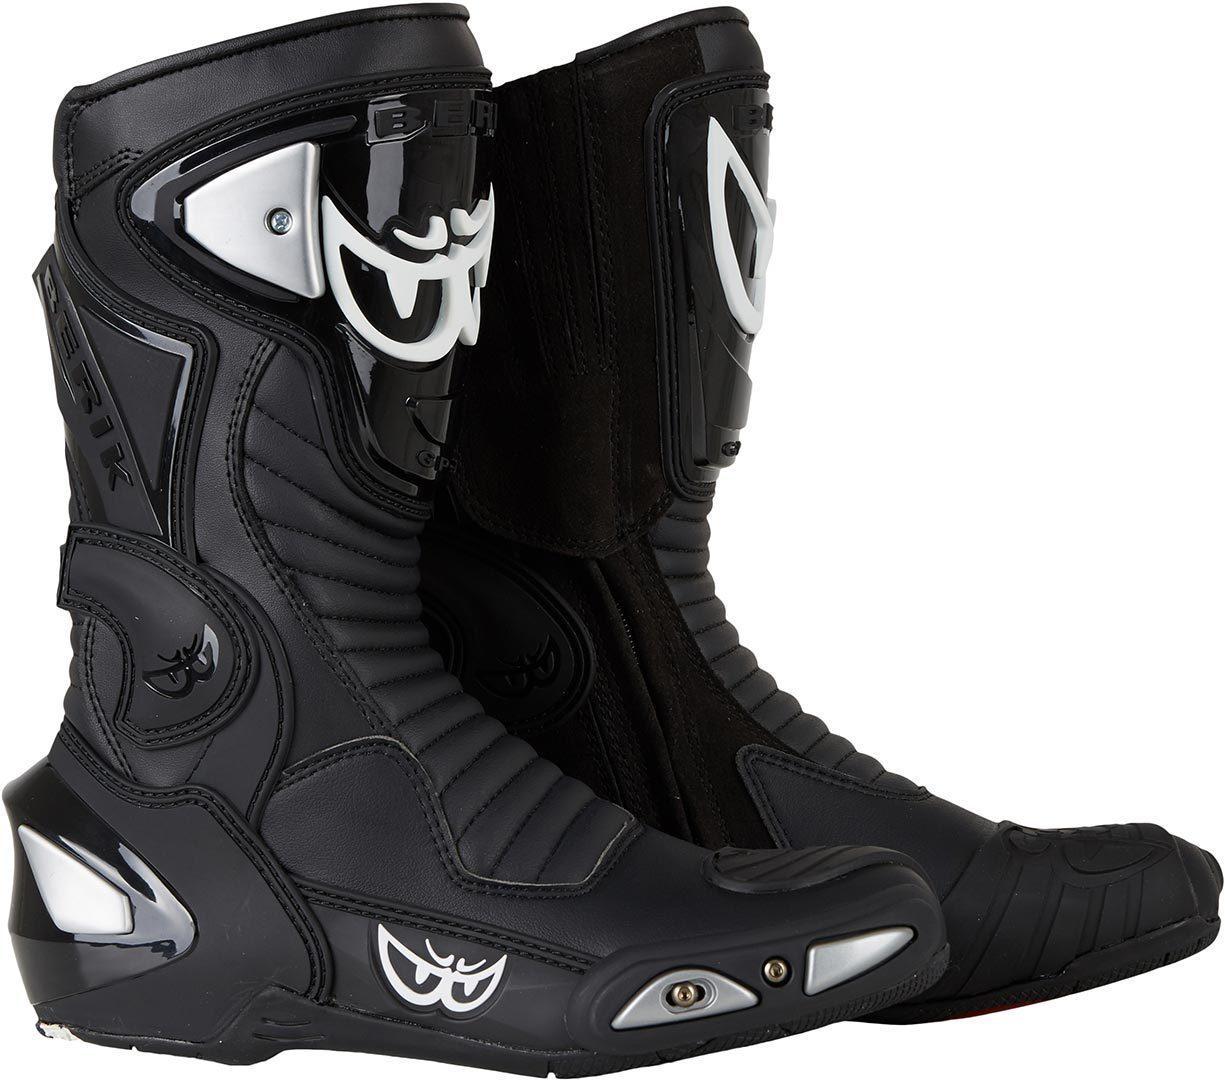 Berik Race-X Motorradstiefel, schwarz, Größe 44, schwarz, Größe 44